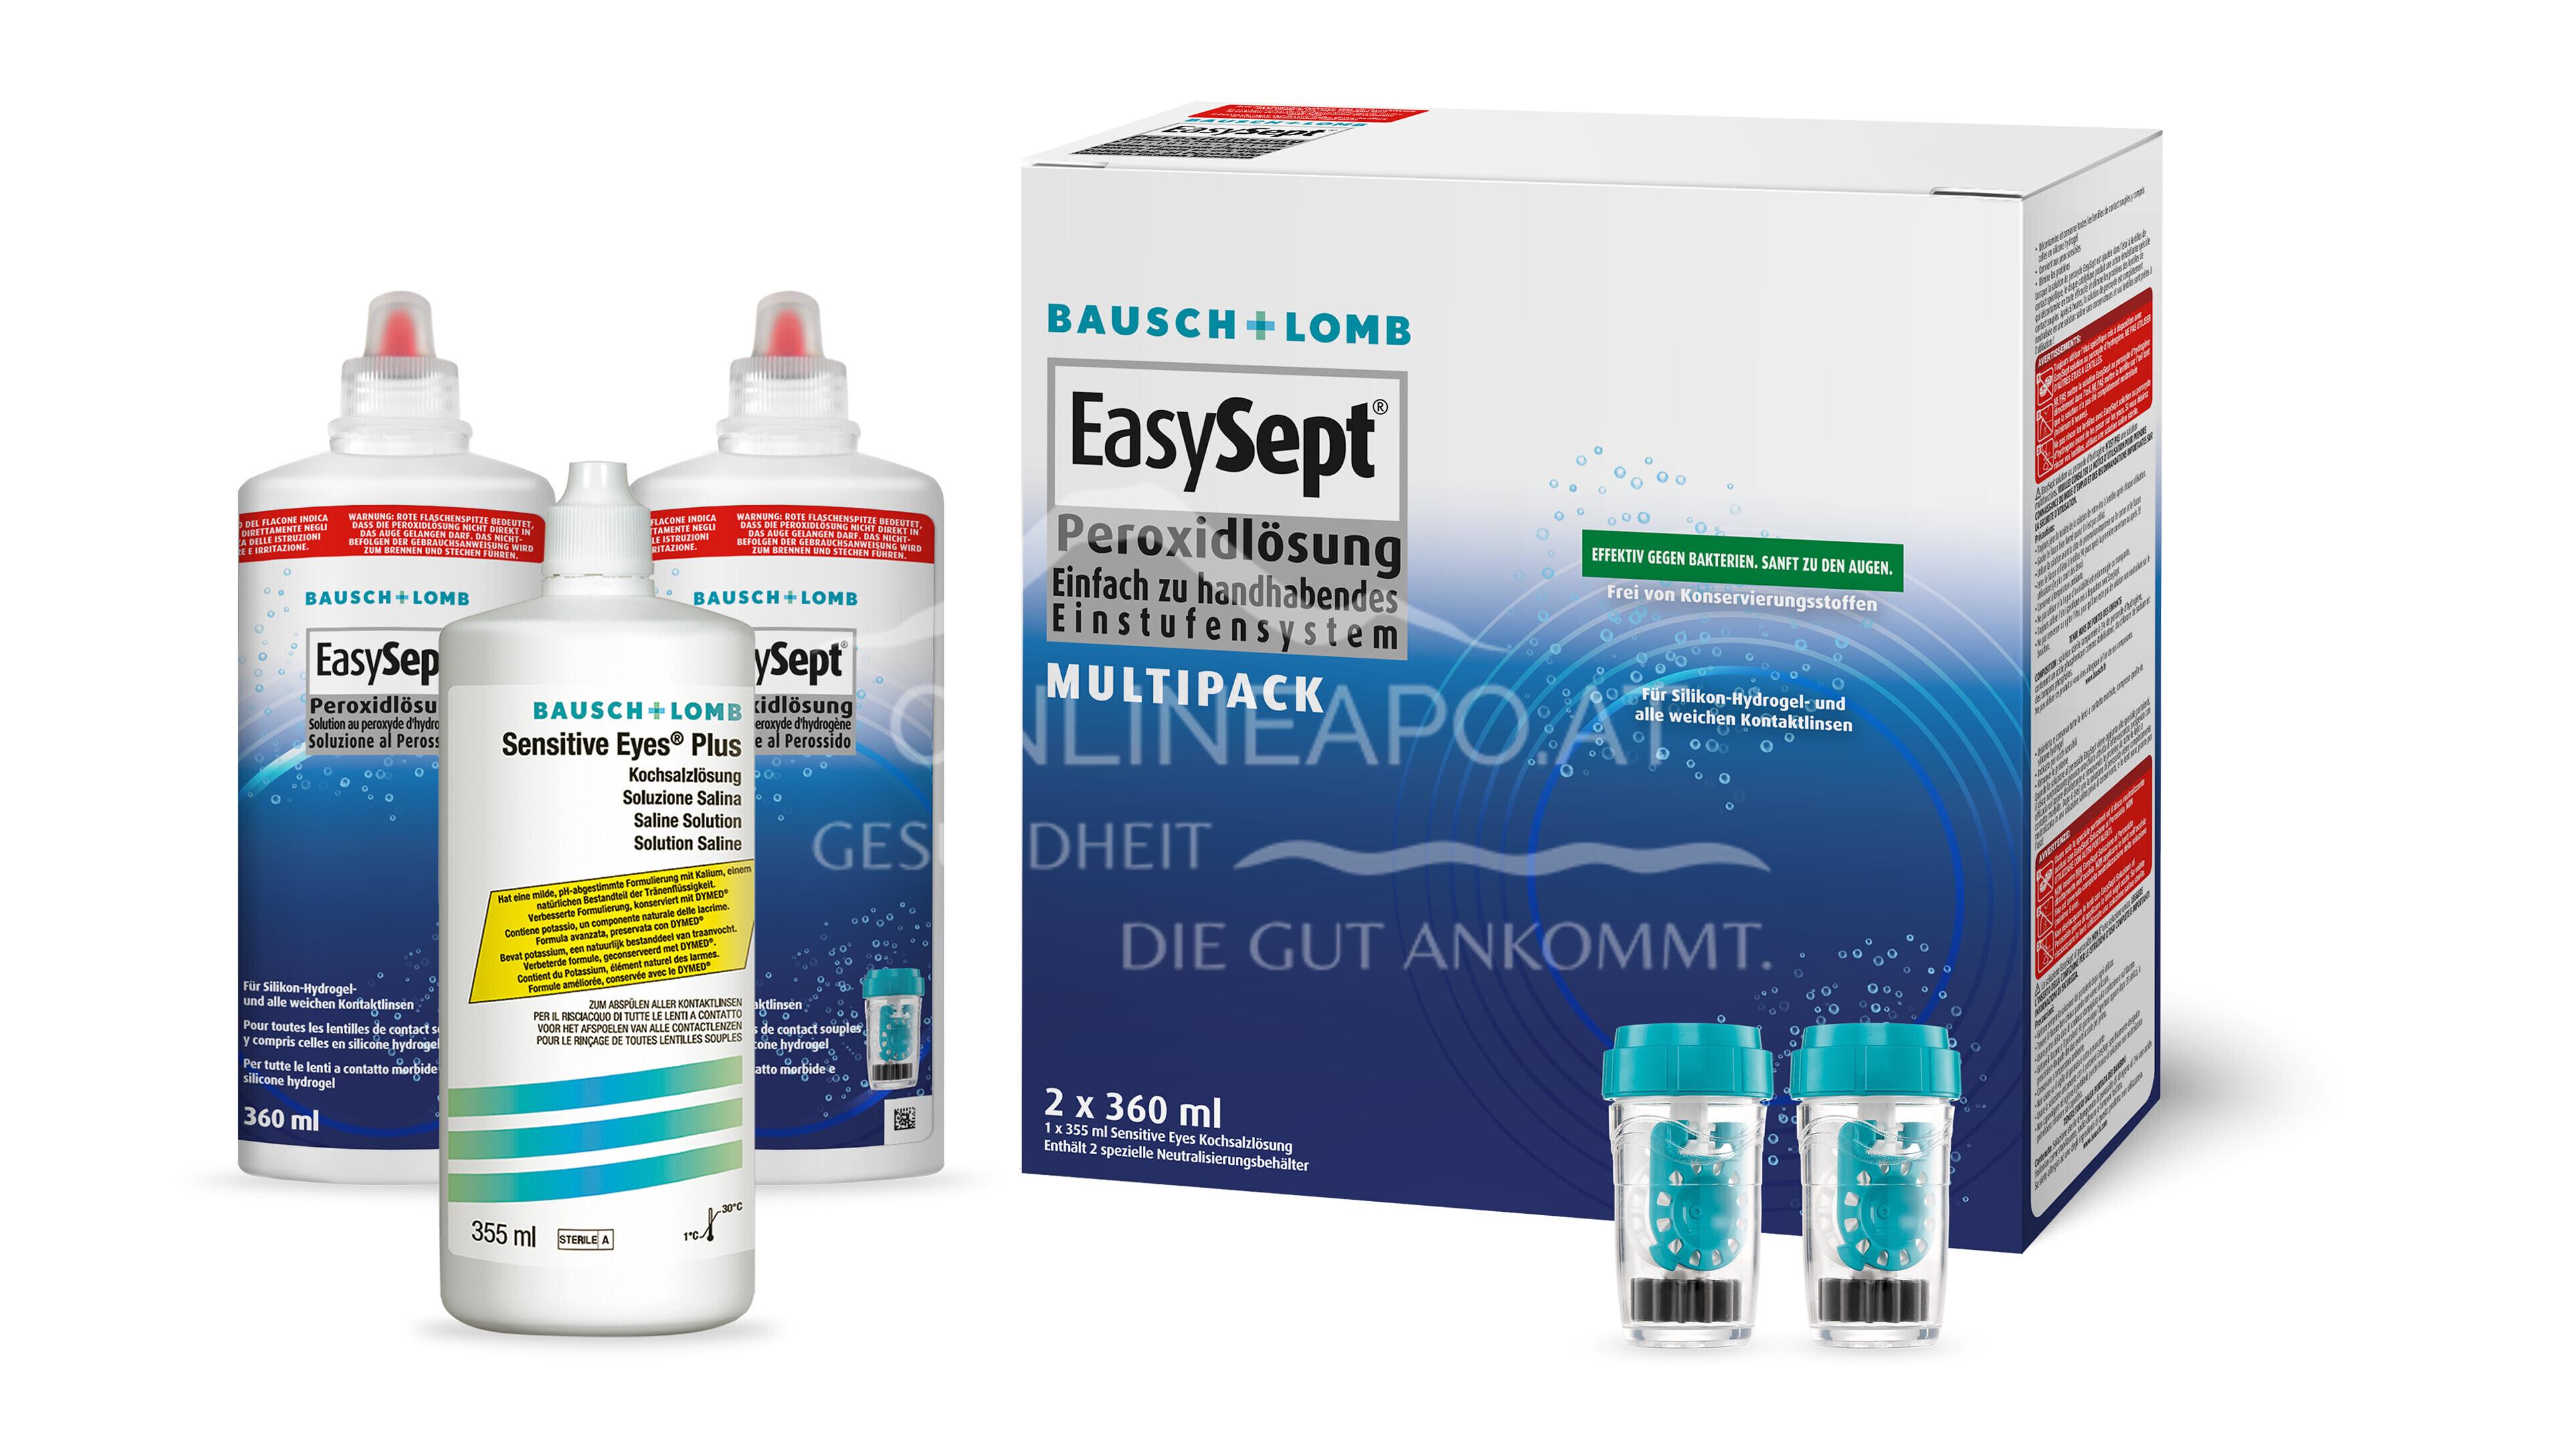 Easysept Peroxidlösung Multipack